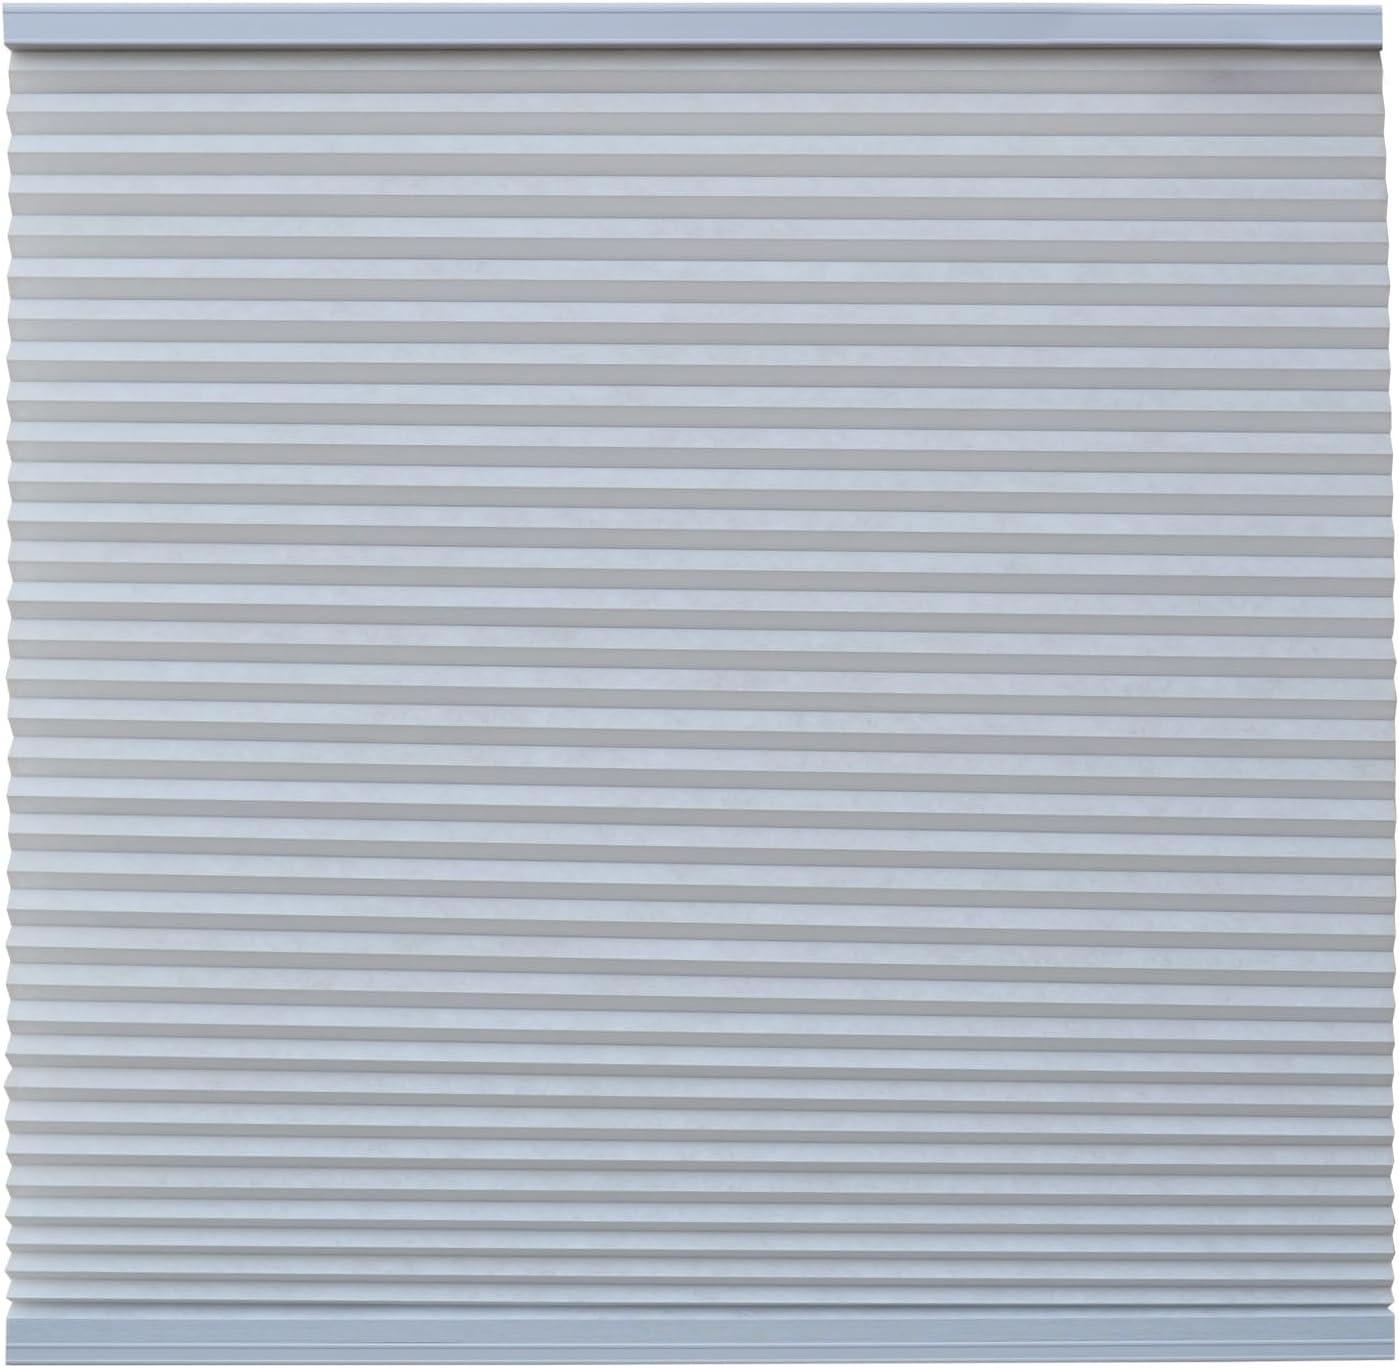 Daily bargain sale Keystone Fabrics A.3100.48.5LF Light Cordless Filtering Max 65% OFF Cellular